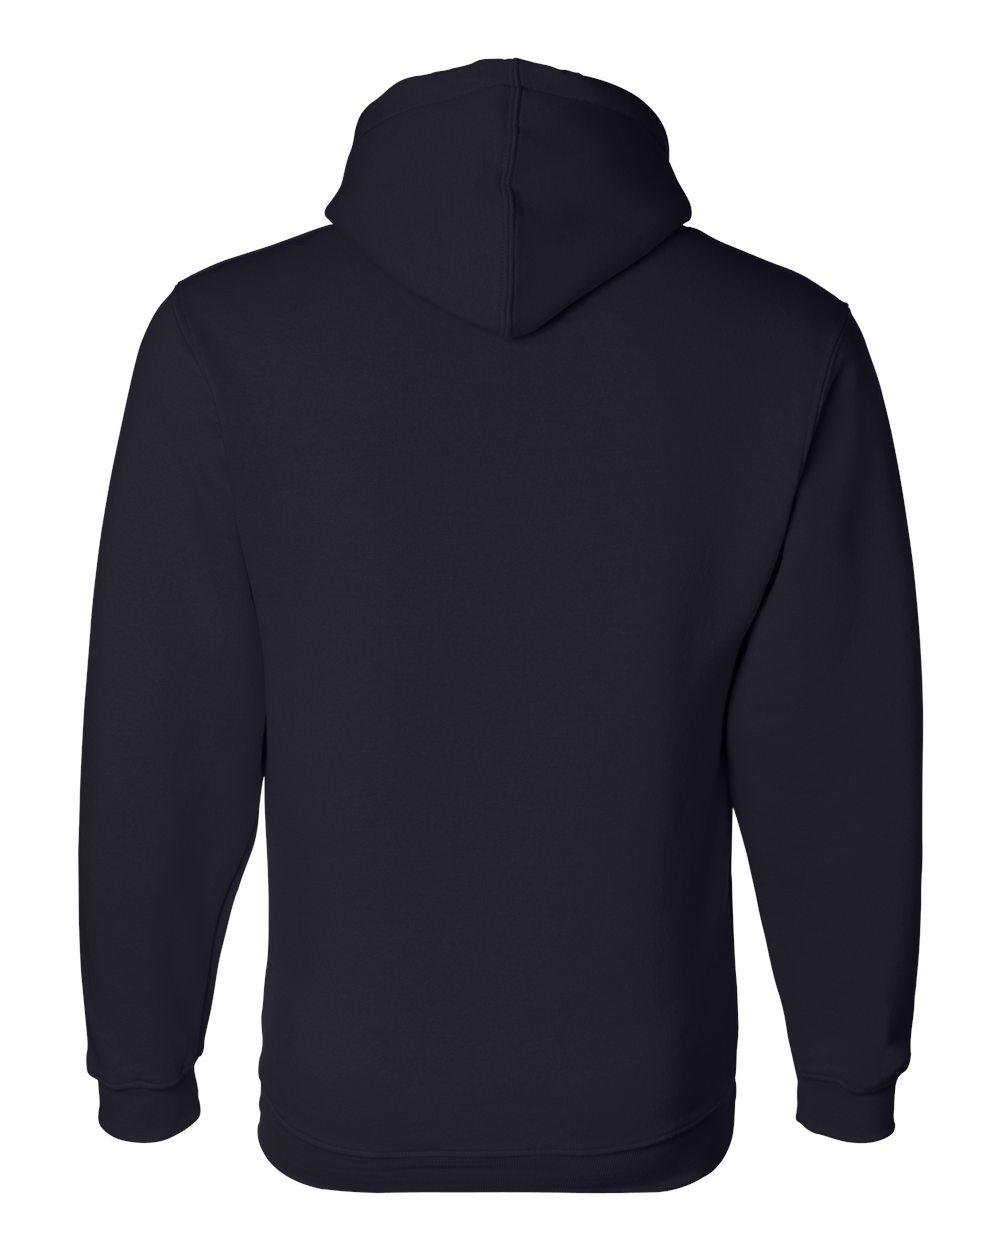 Bayside-Mens-Blank-USA-Made-Hooded-Sweatshirt-960-up-to-6XL miniature 22